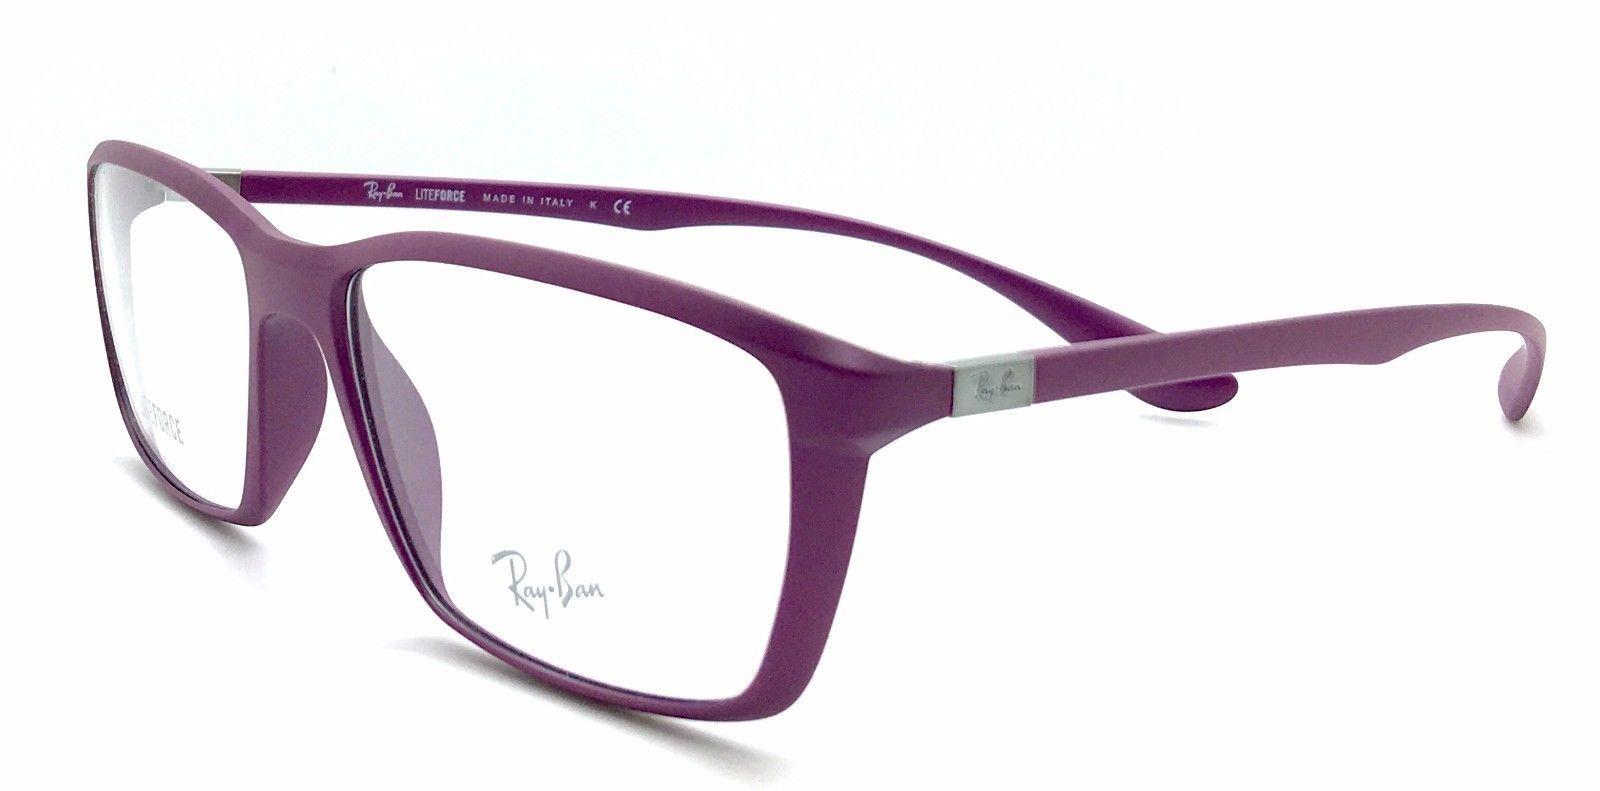 e285c9f5ad7 Ray Ban New LightForce Eyeglasses RB 7018 and 50 similar items. 57